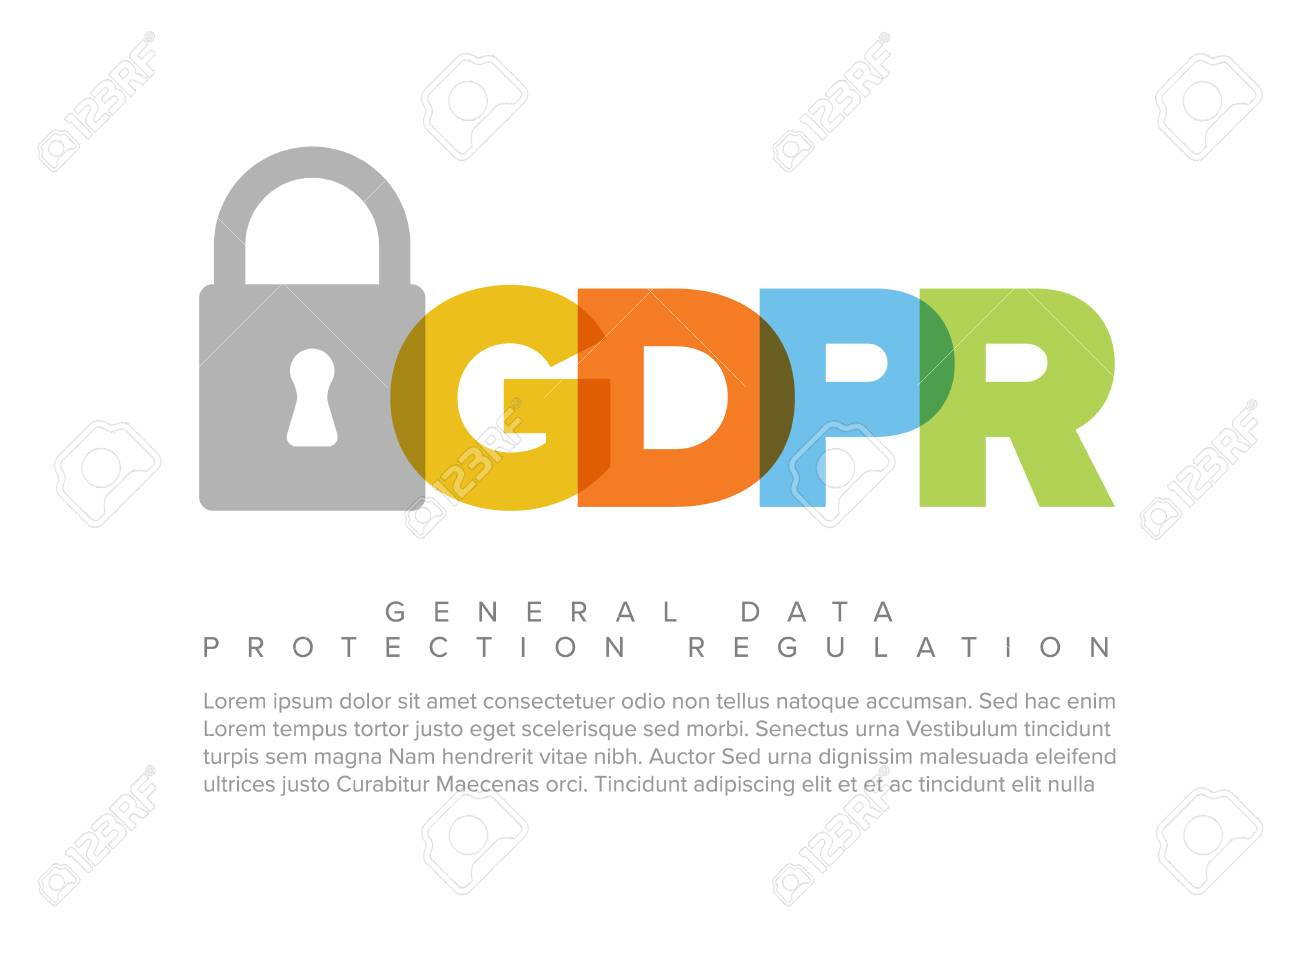 European GDPR concept flyer header template illustration - 95585507